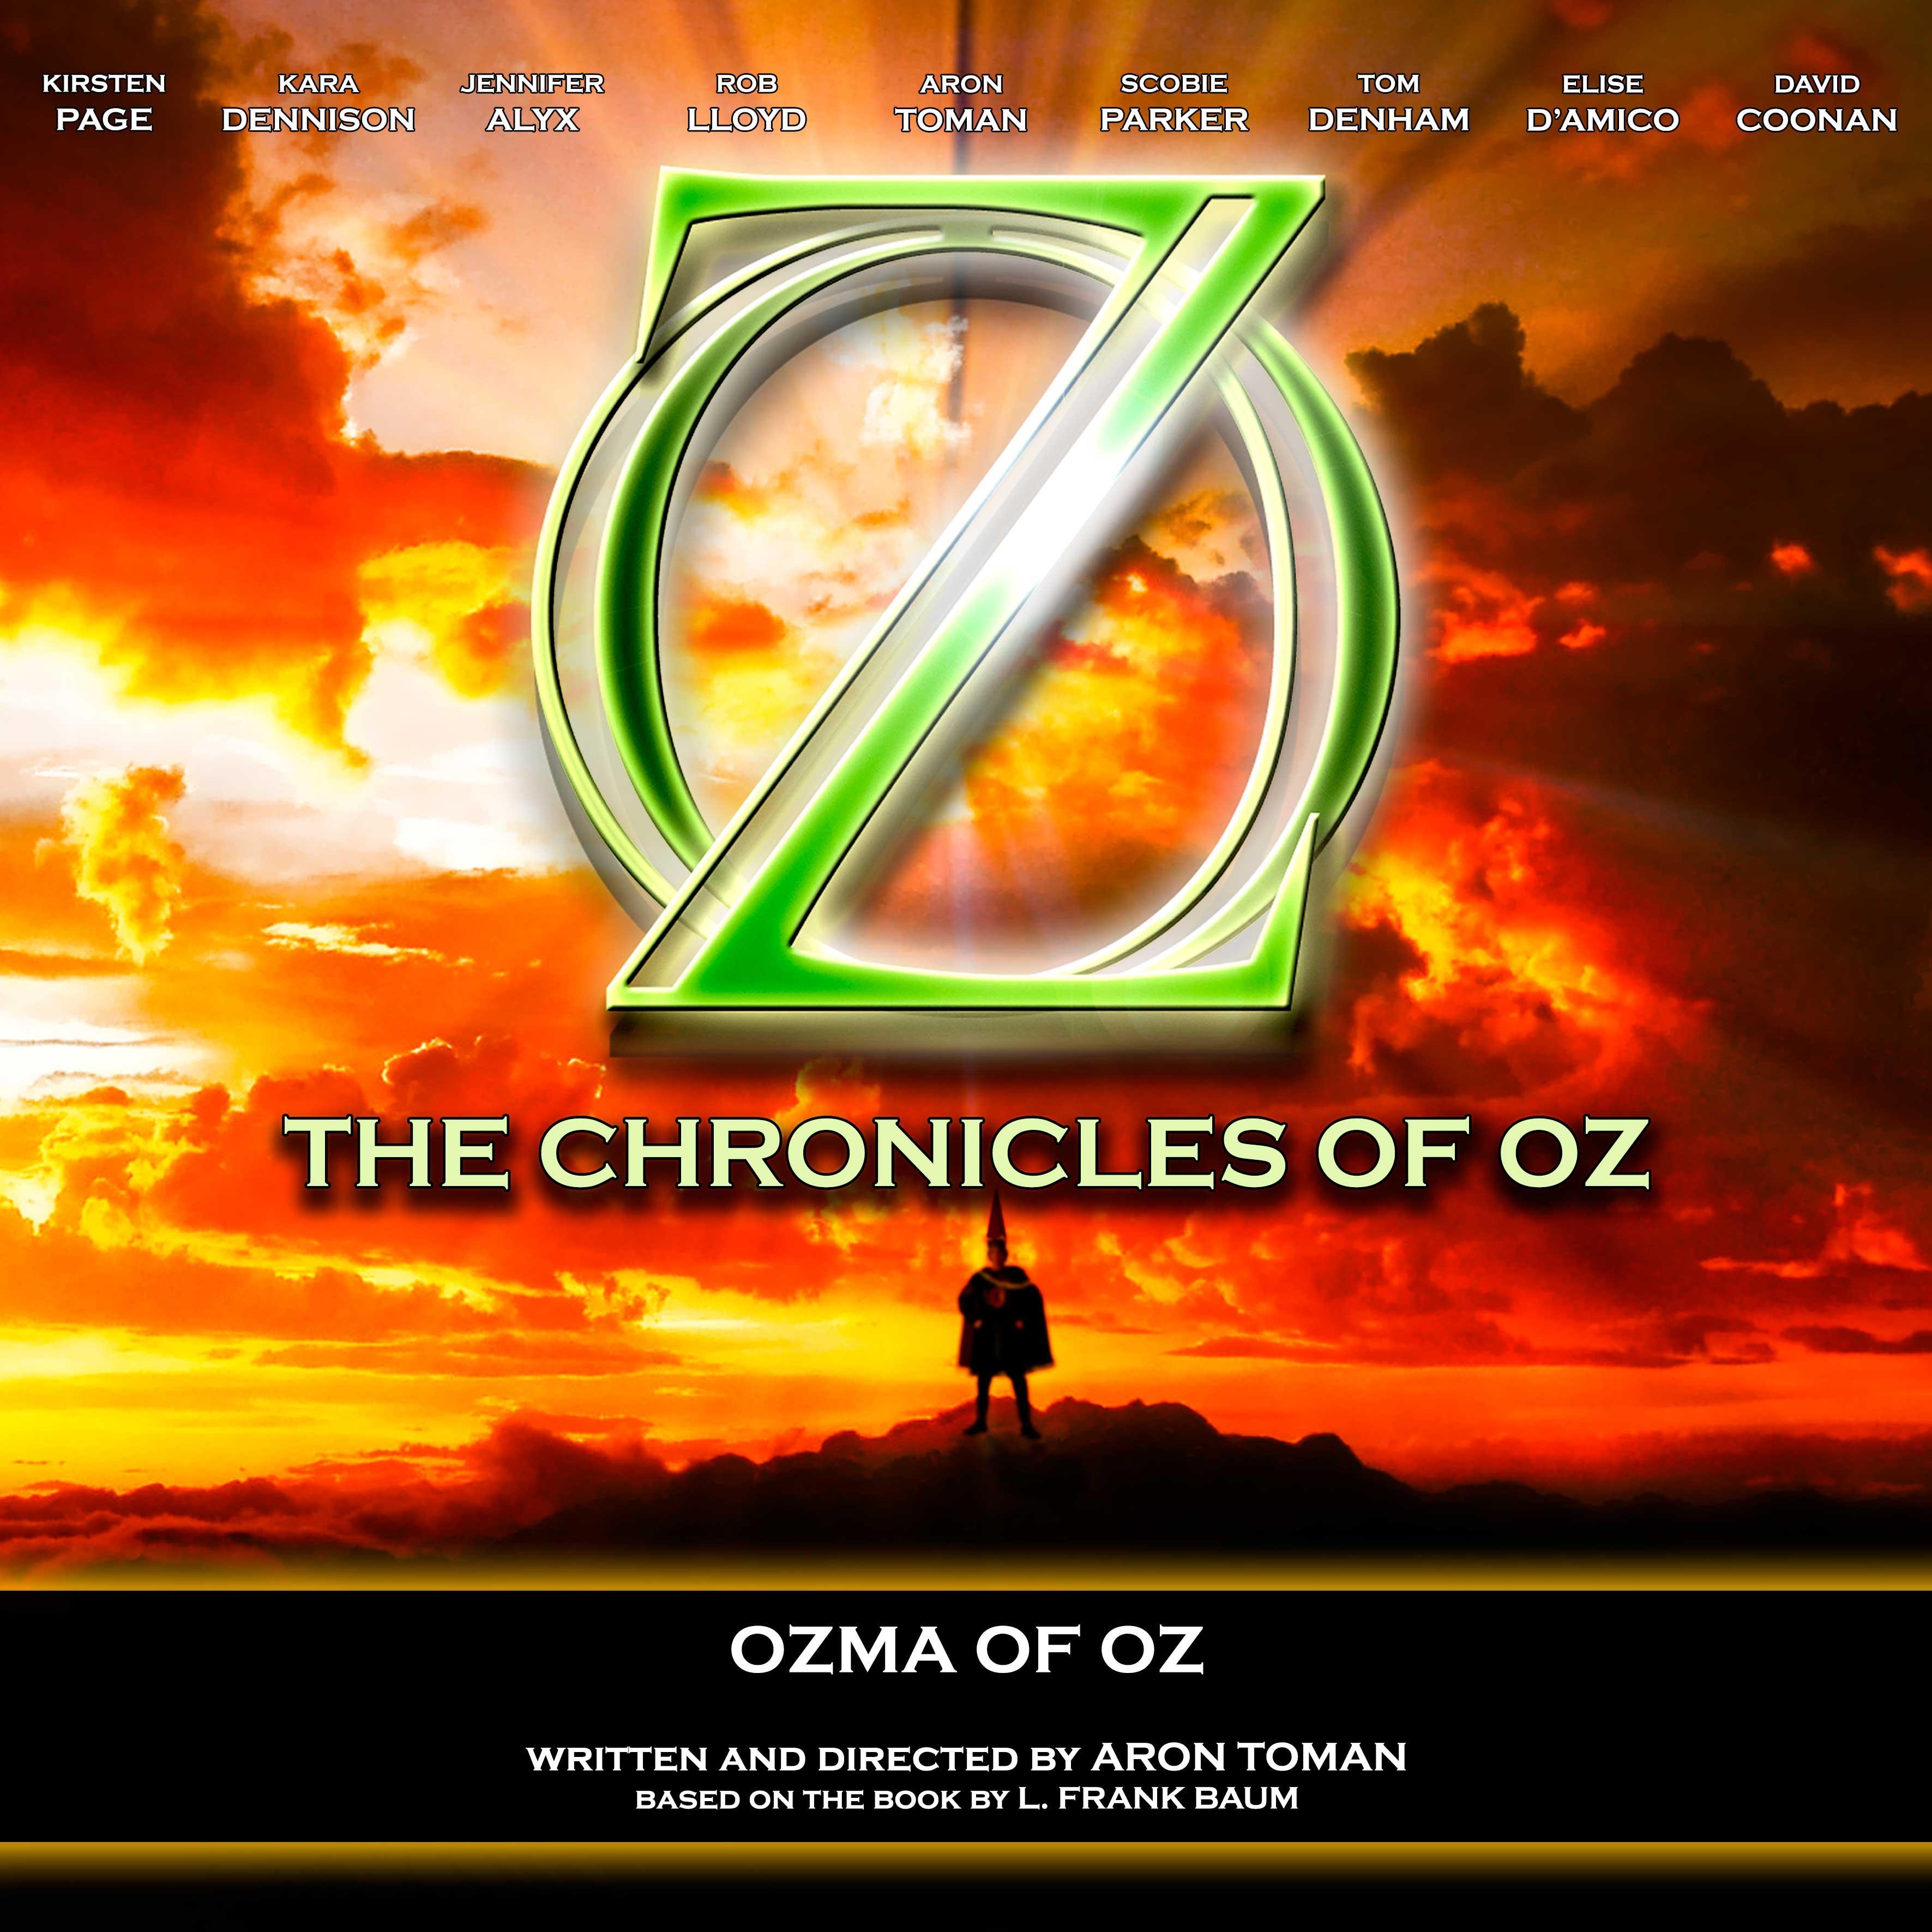 Ozma of Oz - Episode 4